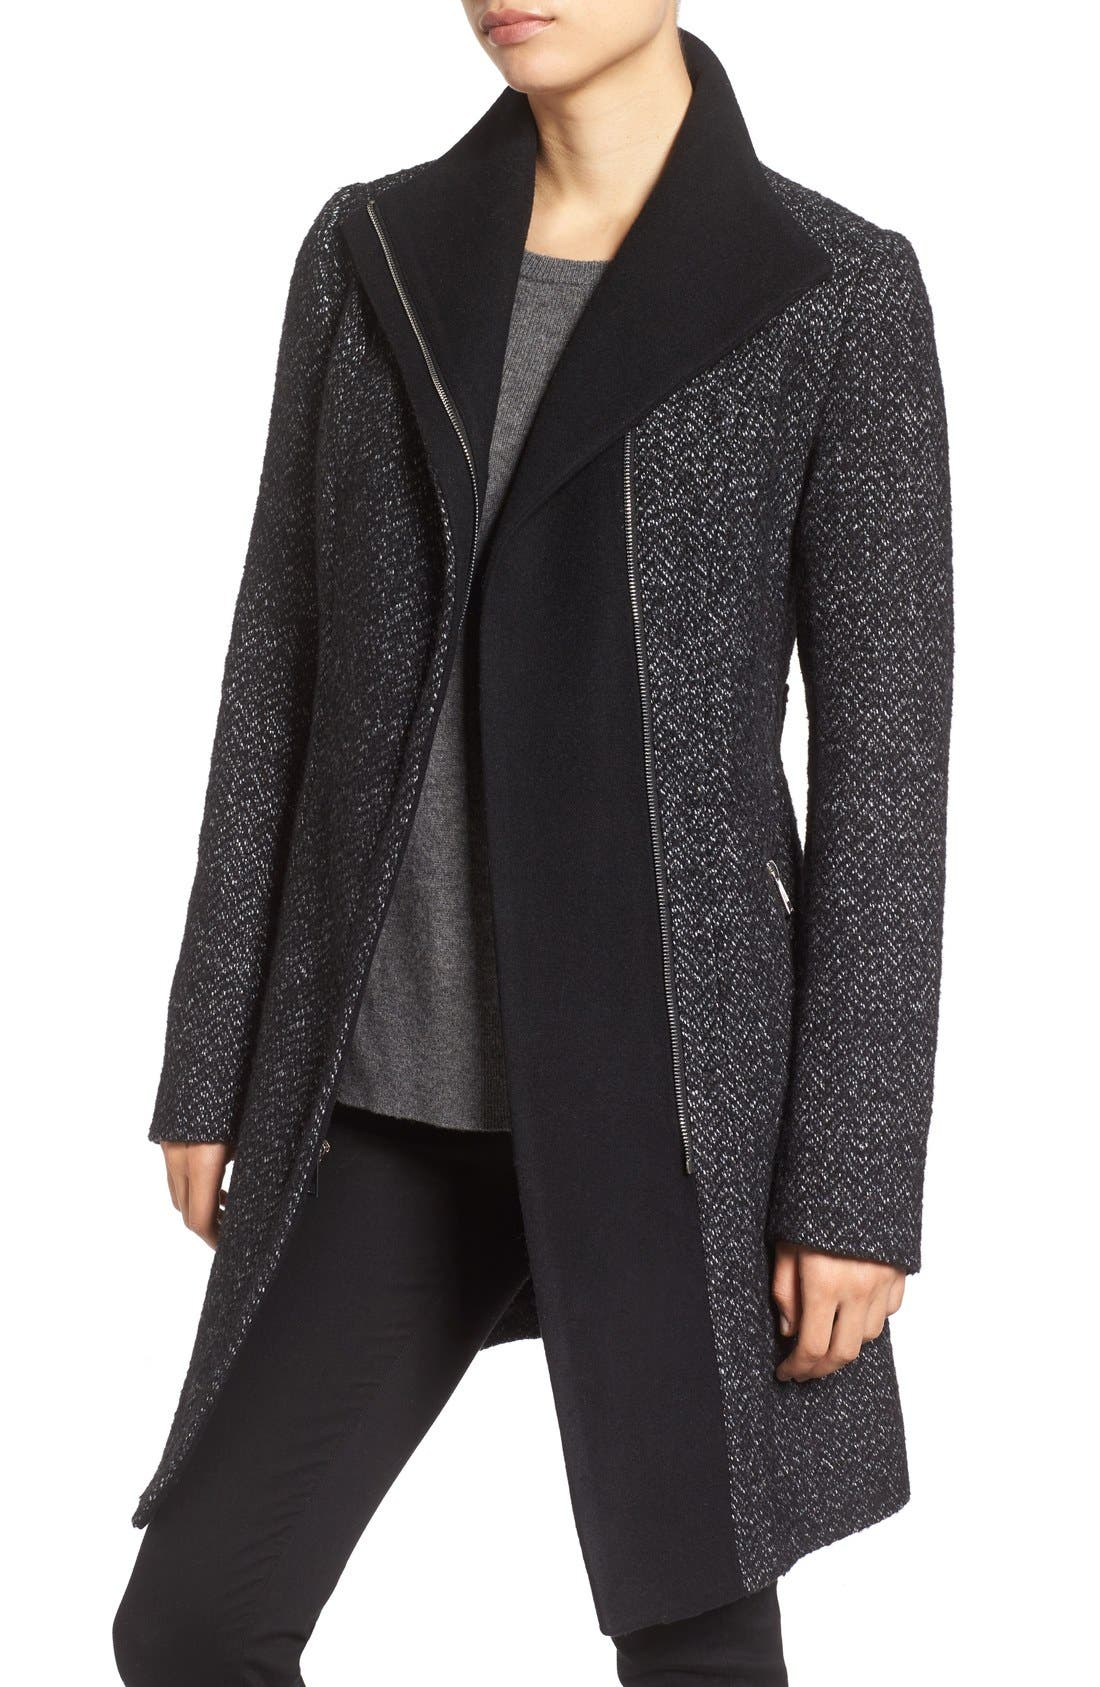 'Eva' Belted Tweed Jacket,                             Alternate thumbnail 4, color,                             008